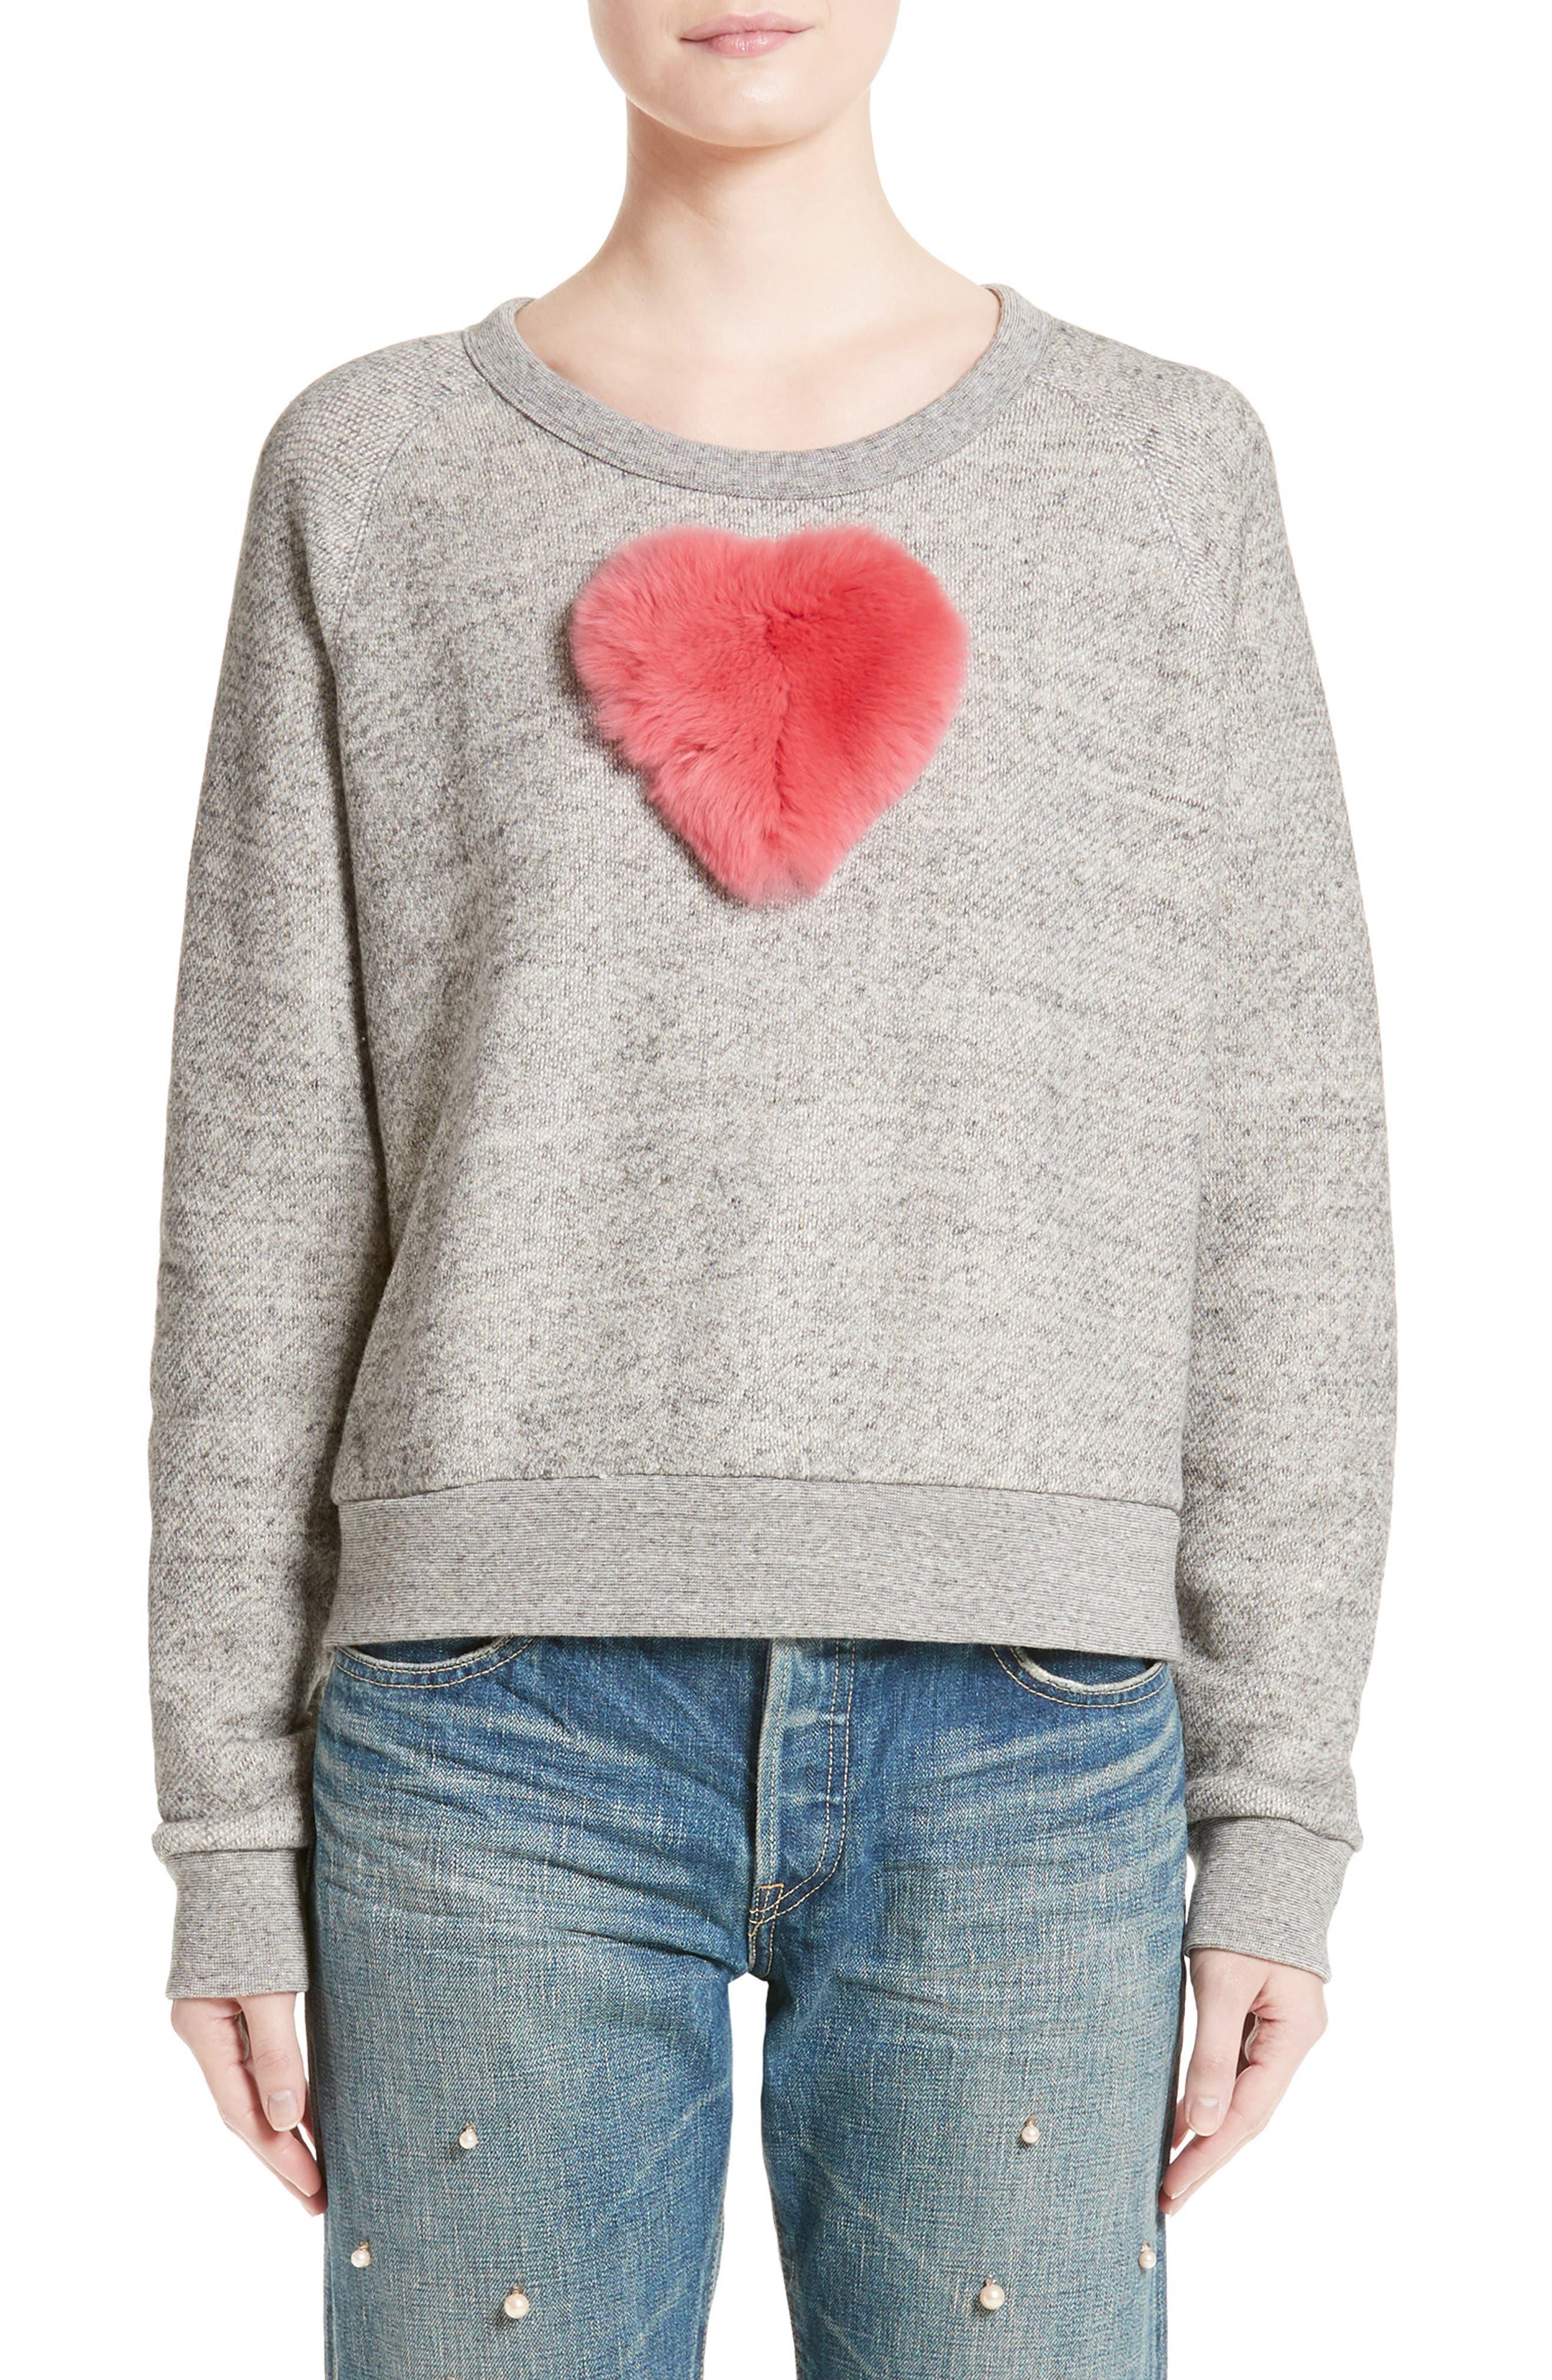 Main Image - Tu es mon TRÉSOR One Heart Pullover